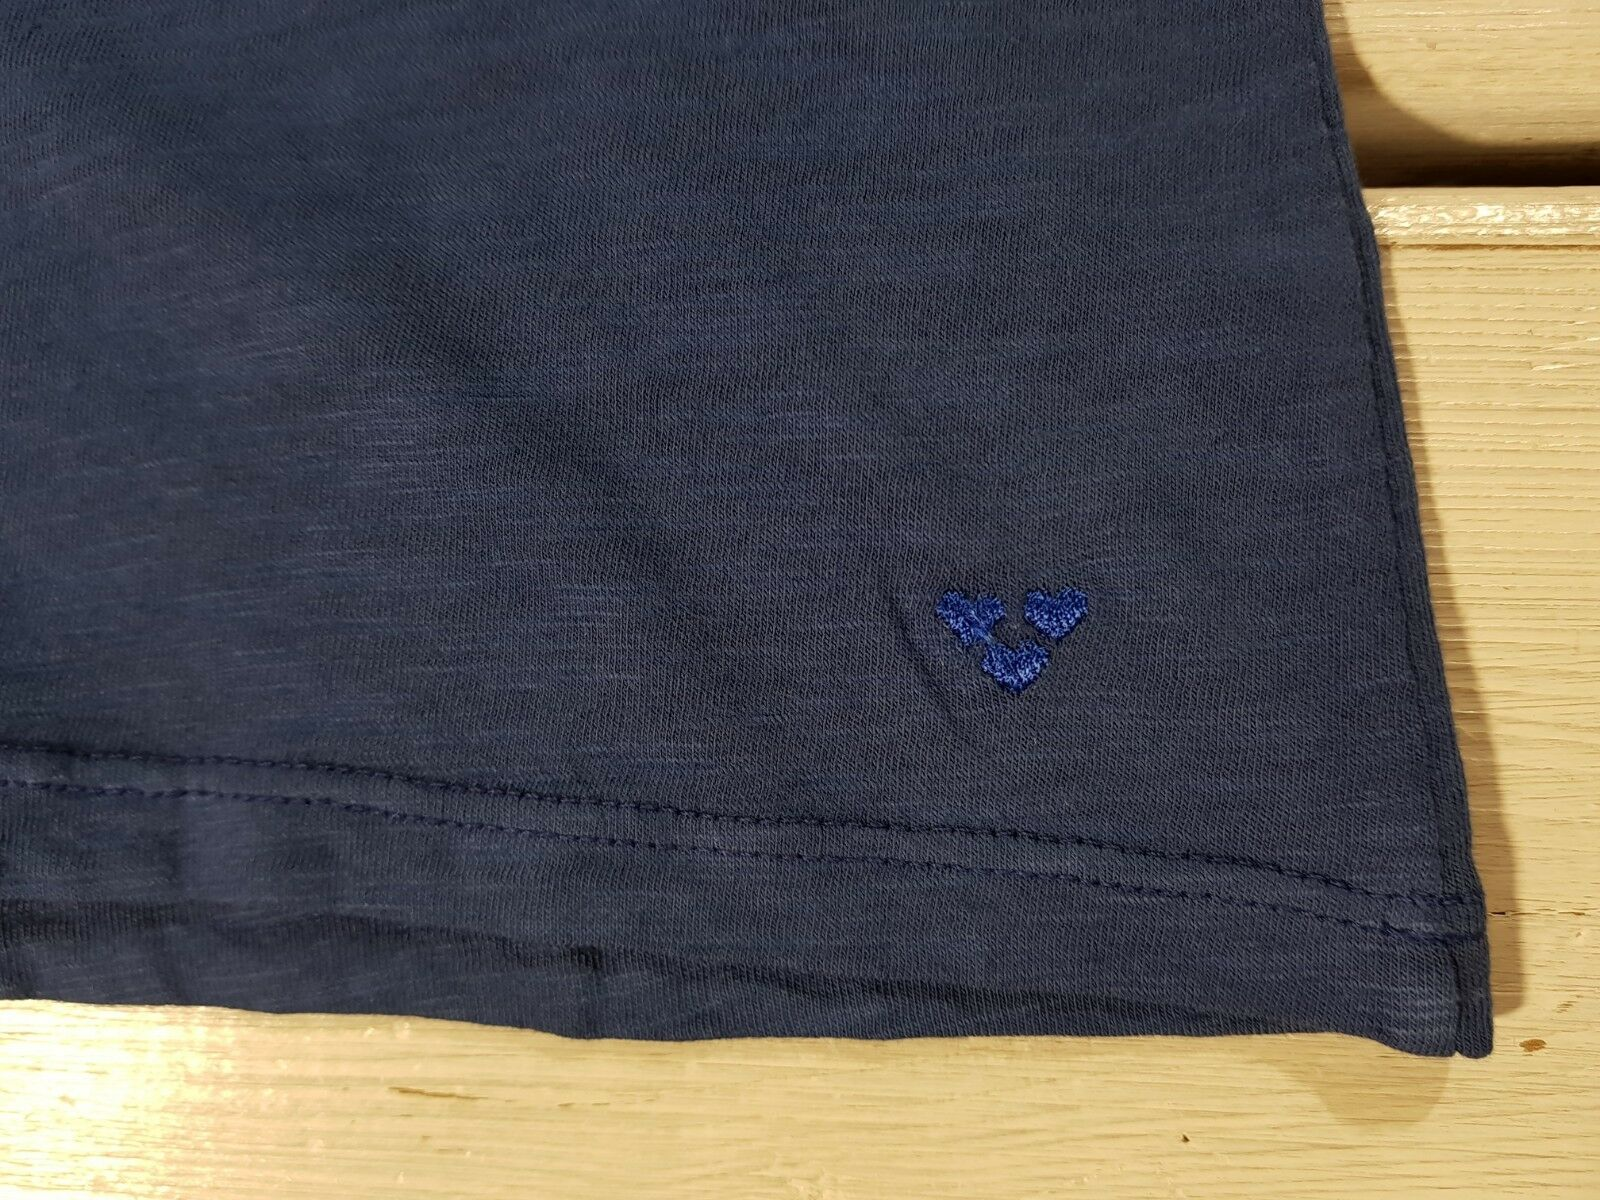 8c69a26ddd Nuovo Nuovo Nuovo My Twin Twinset UOMO T-Shirt Taglia XXL Blu Ombre ...